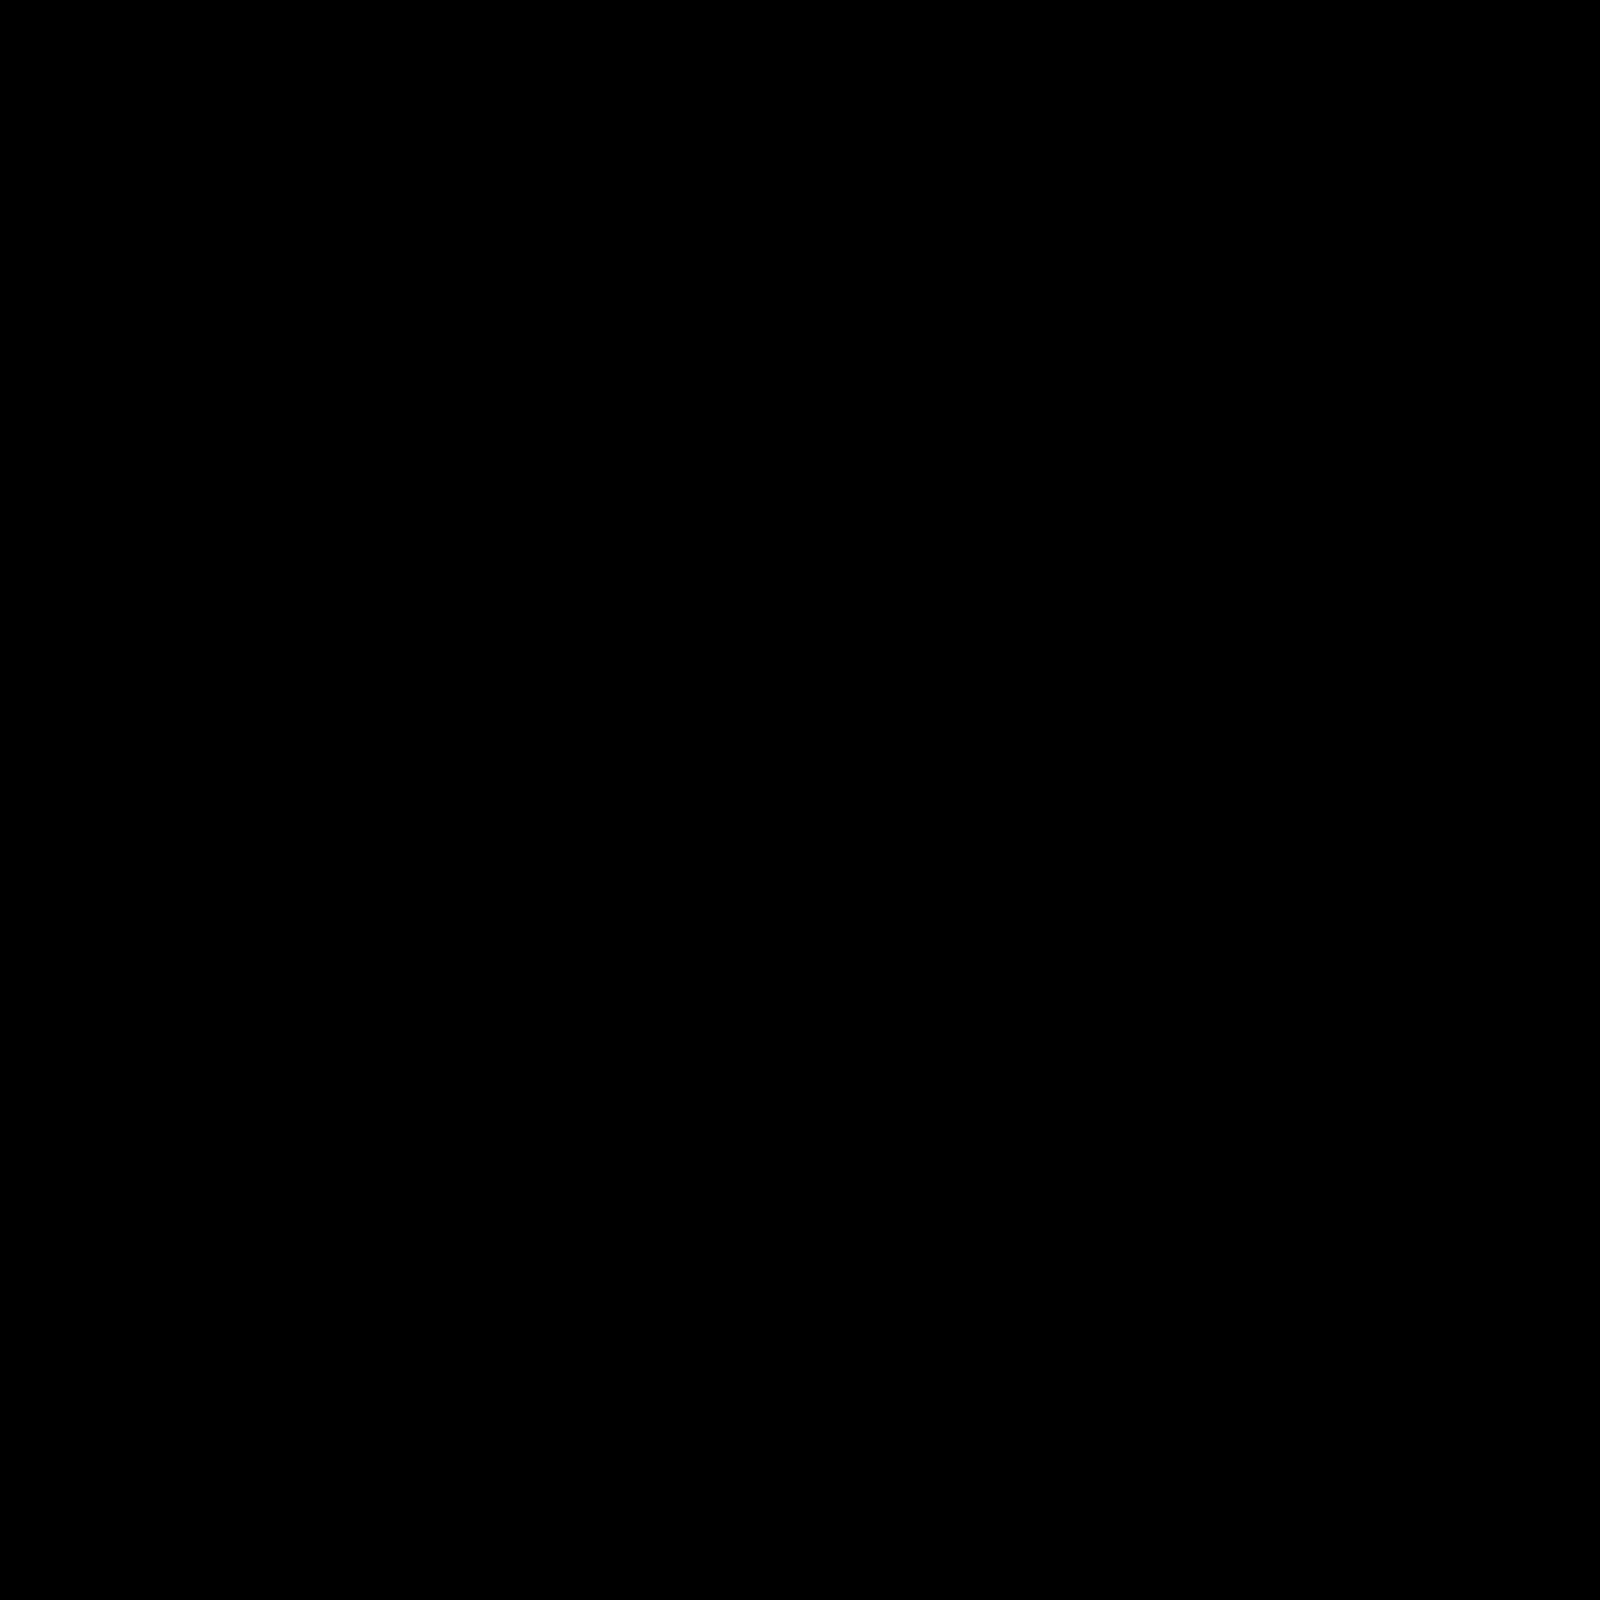 Logo for Arax